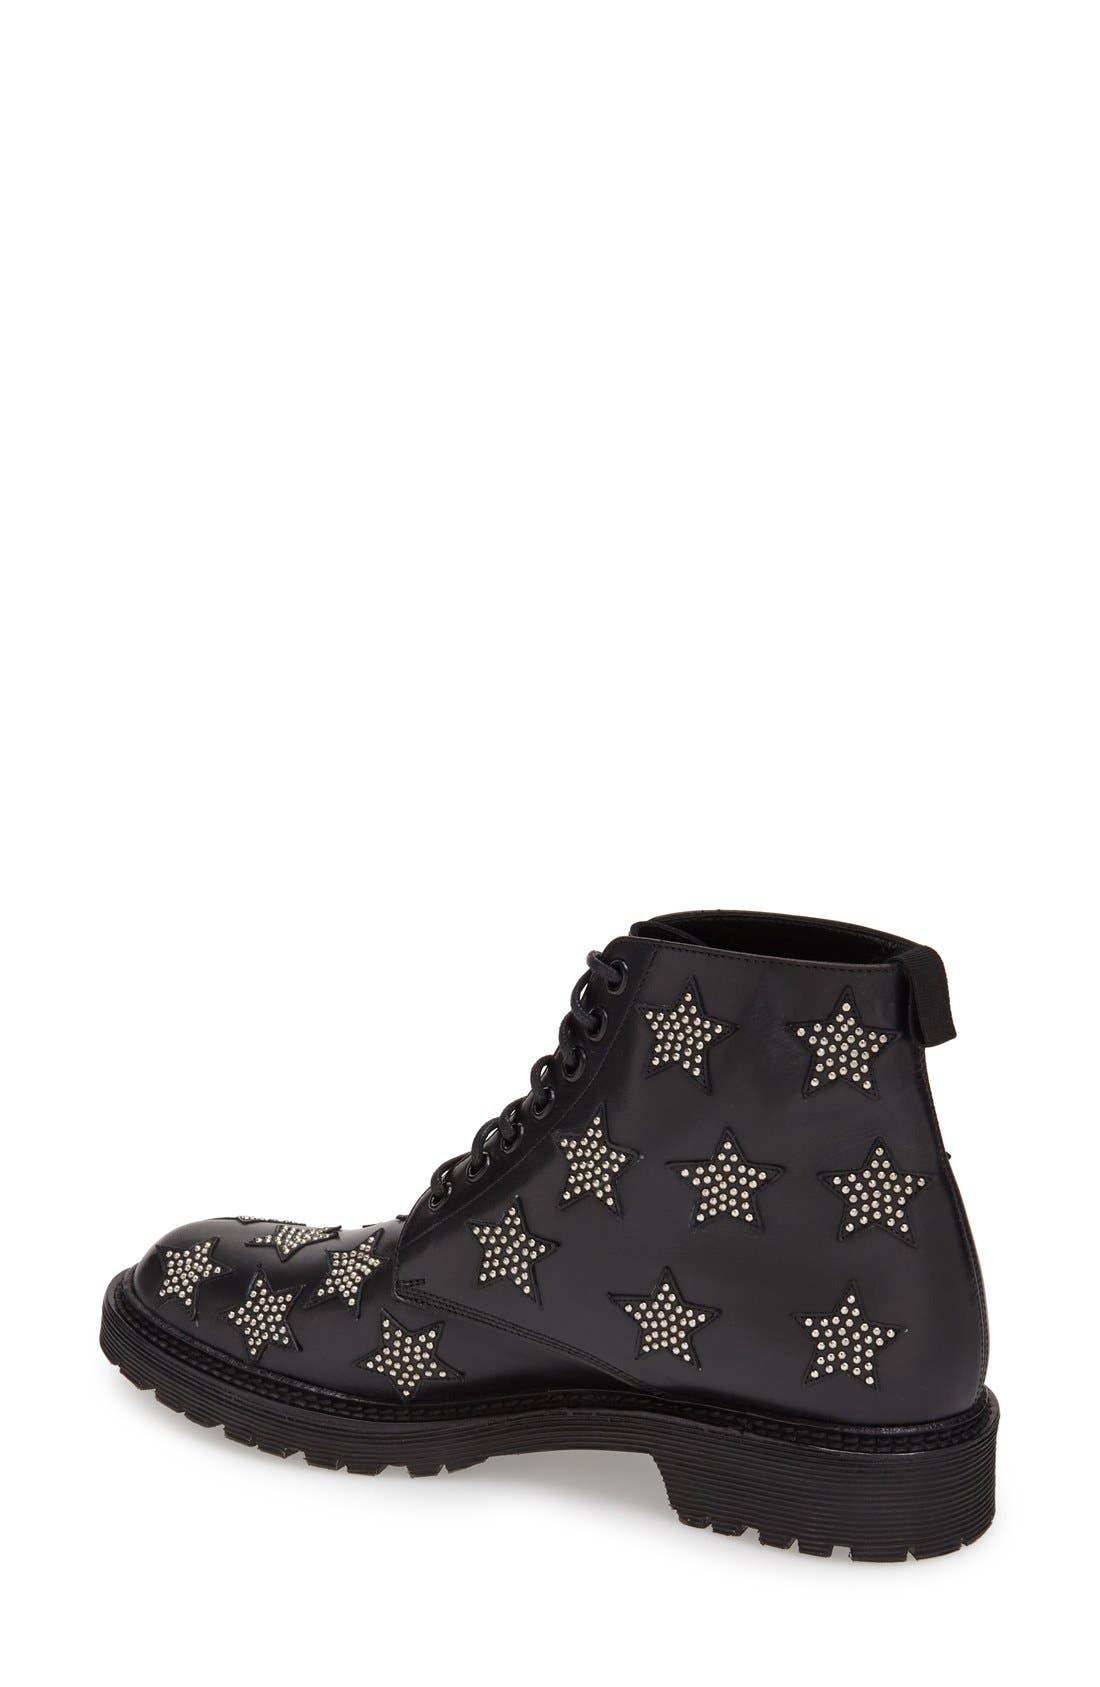 Alternate Image 2  - Saint Laurent 'Army' Lace-Up Boot (Women)